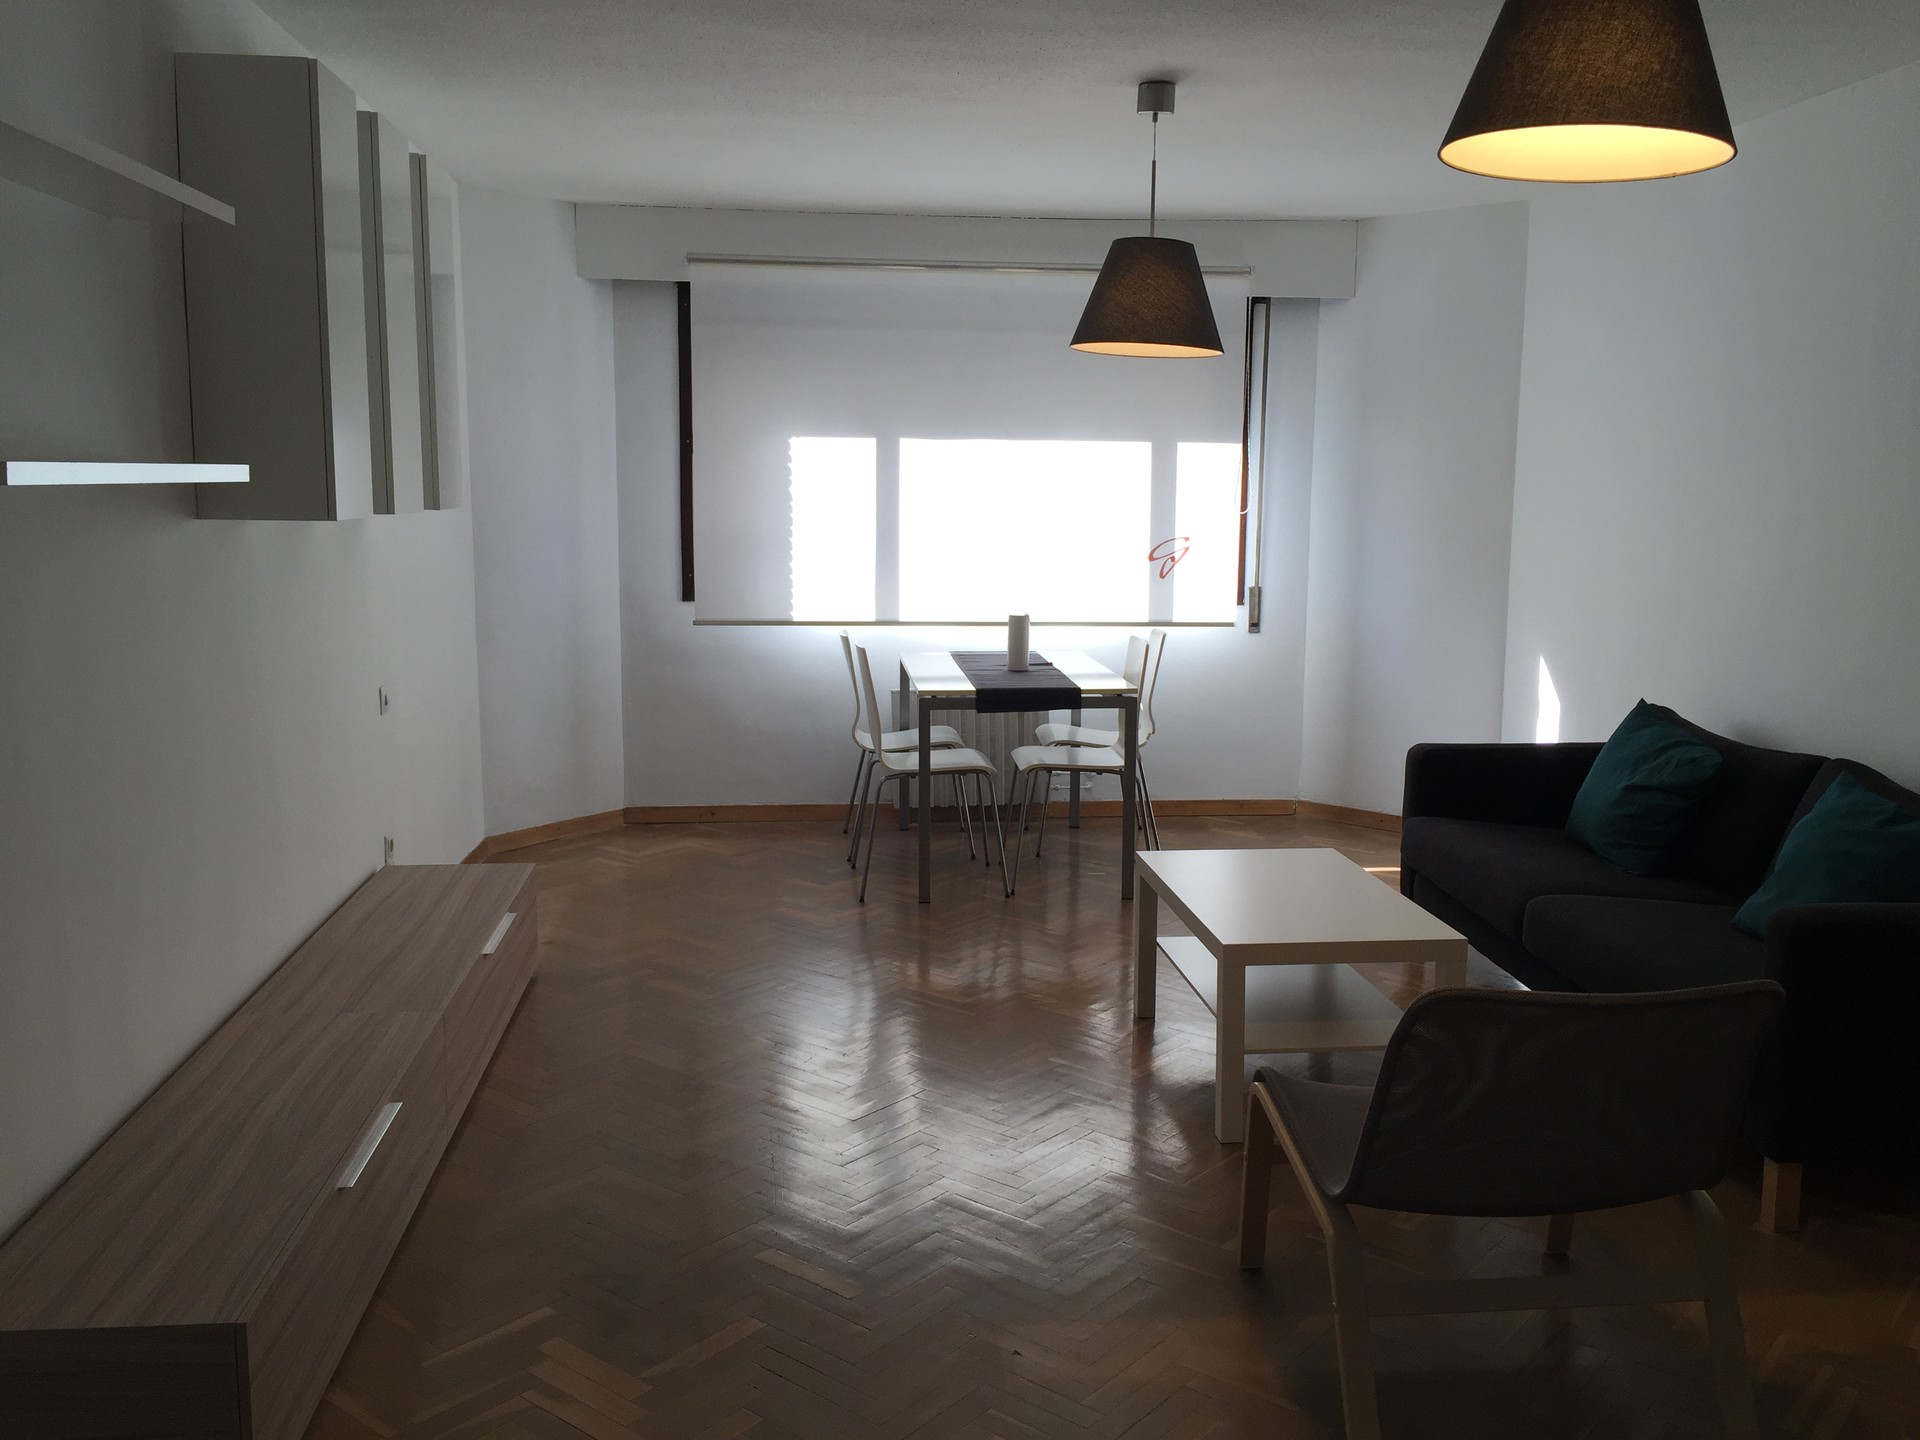 Piso lujo centro center flat alquiler habitaciones zaragoza - Pisos alquiler zaragoza centro ...